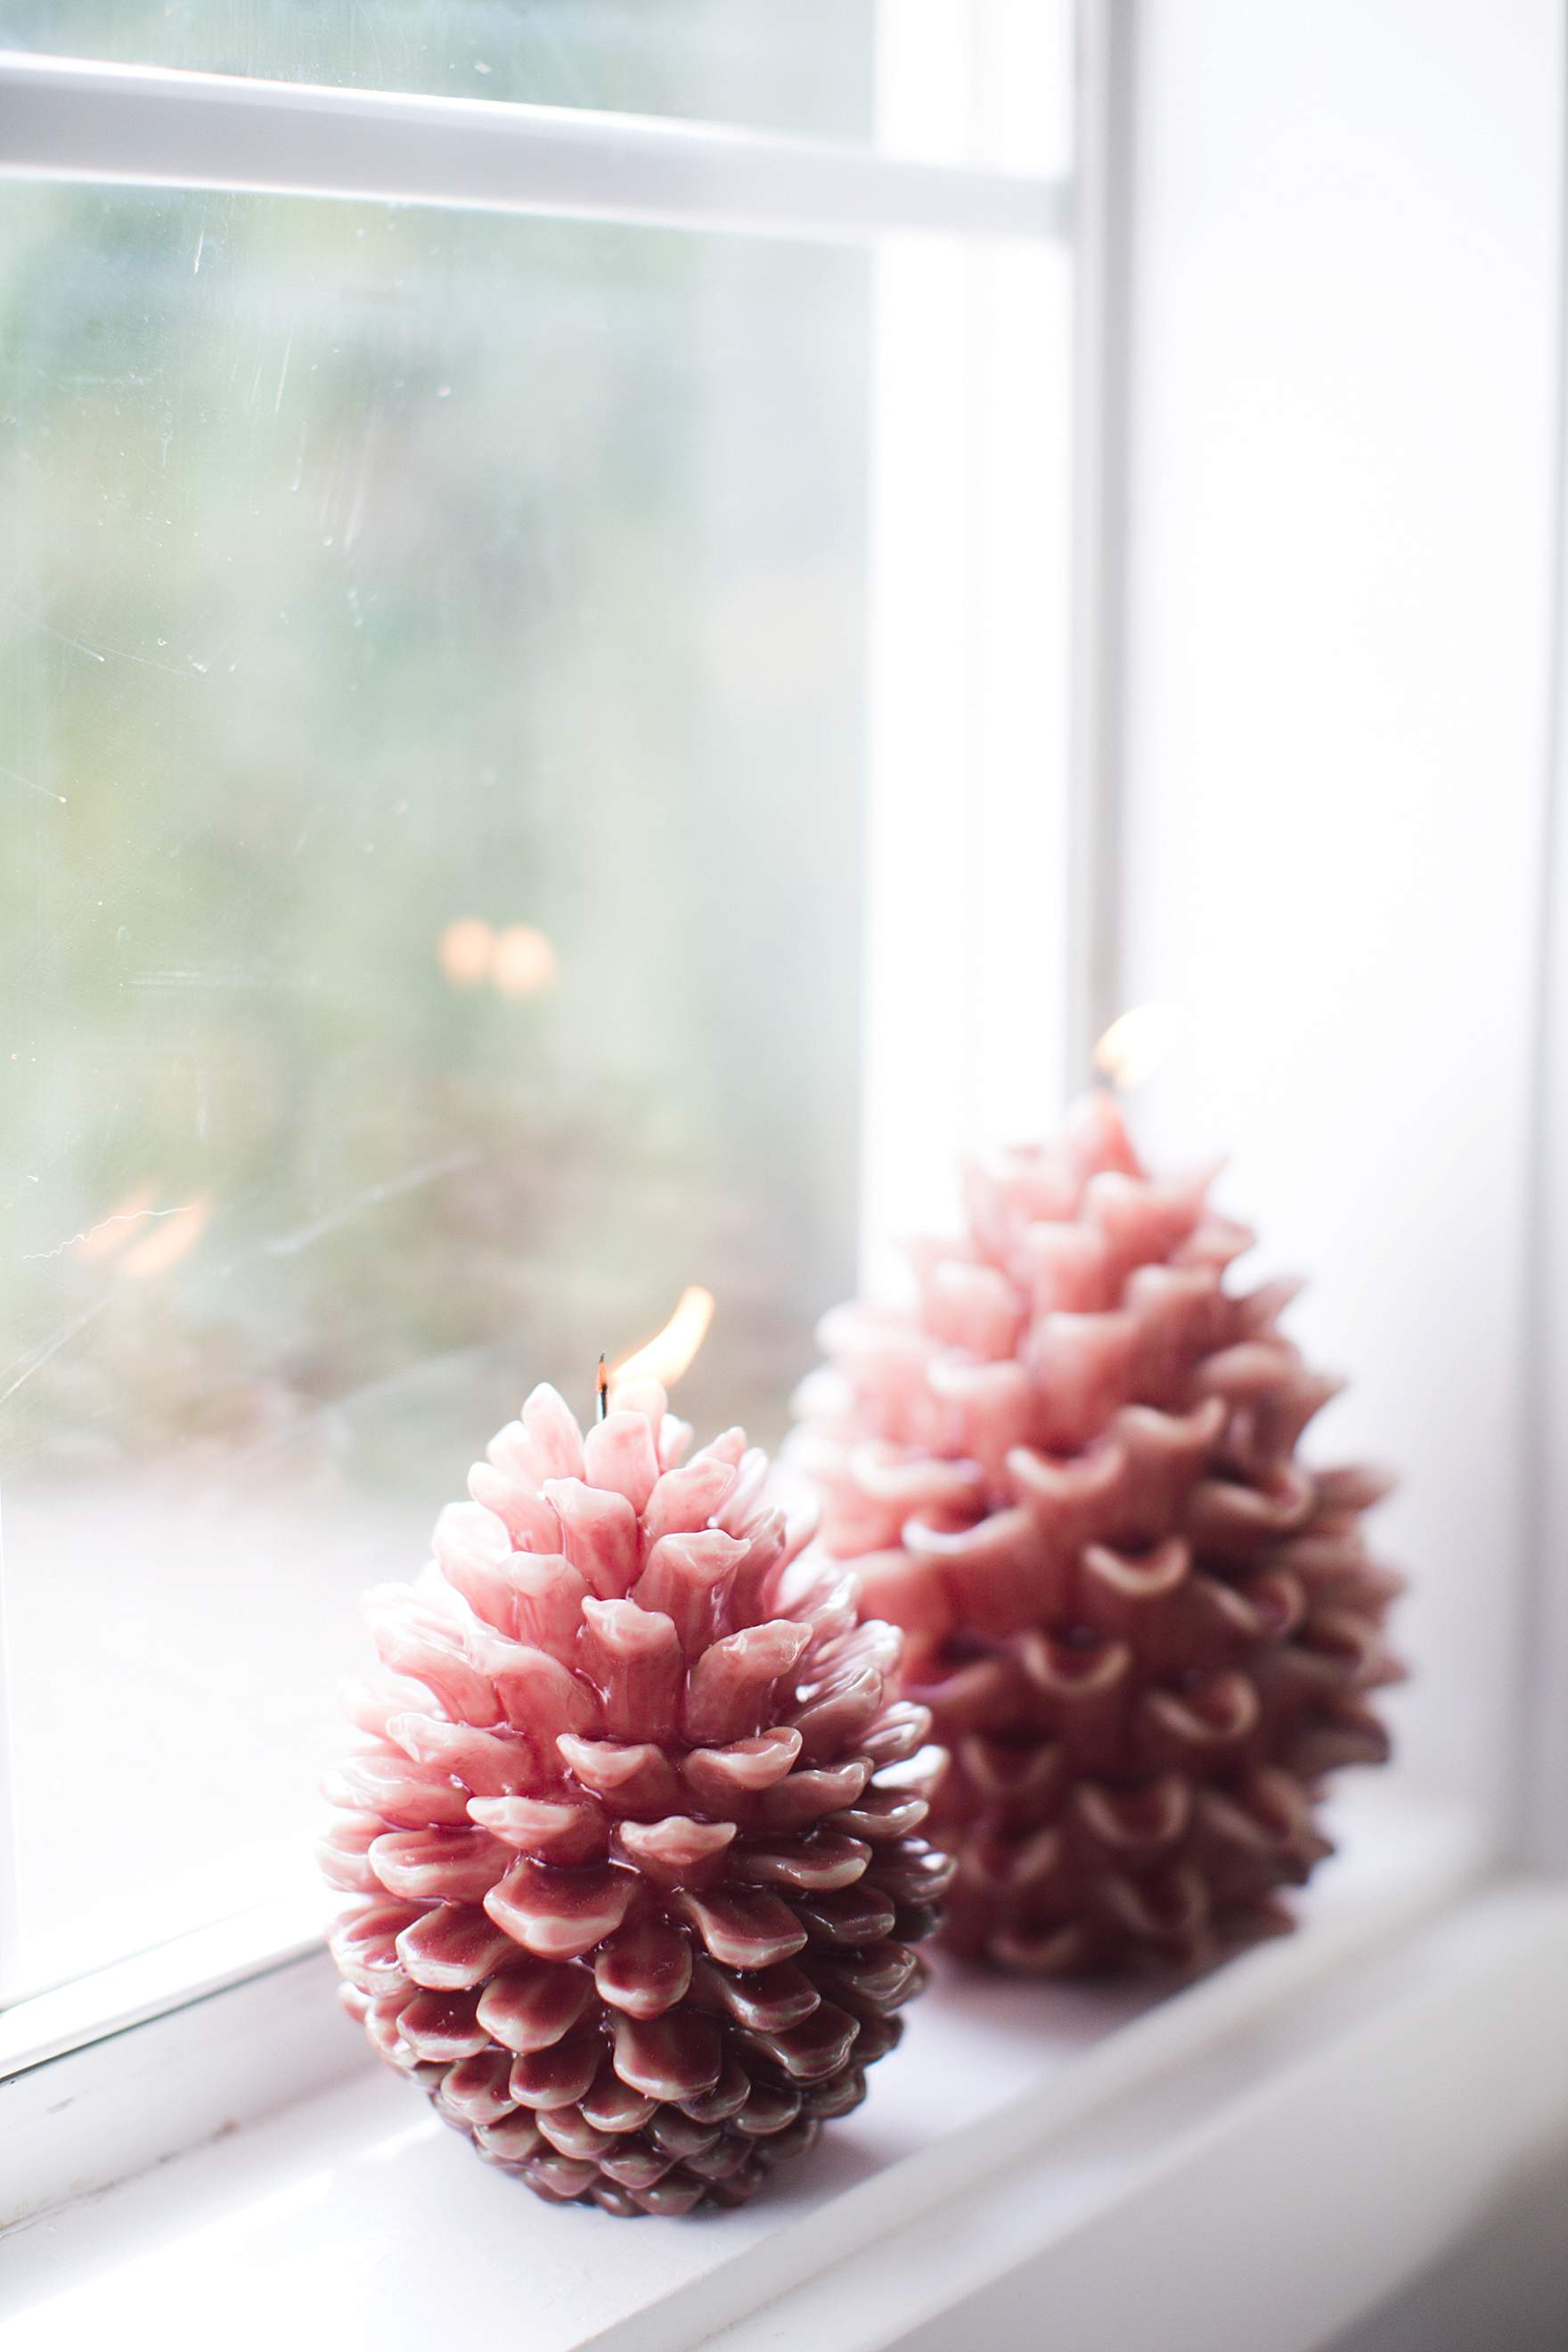 lit pinecones on a windowsill winter shot